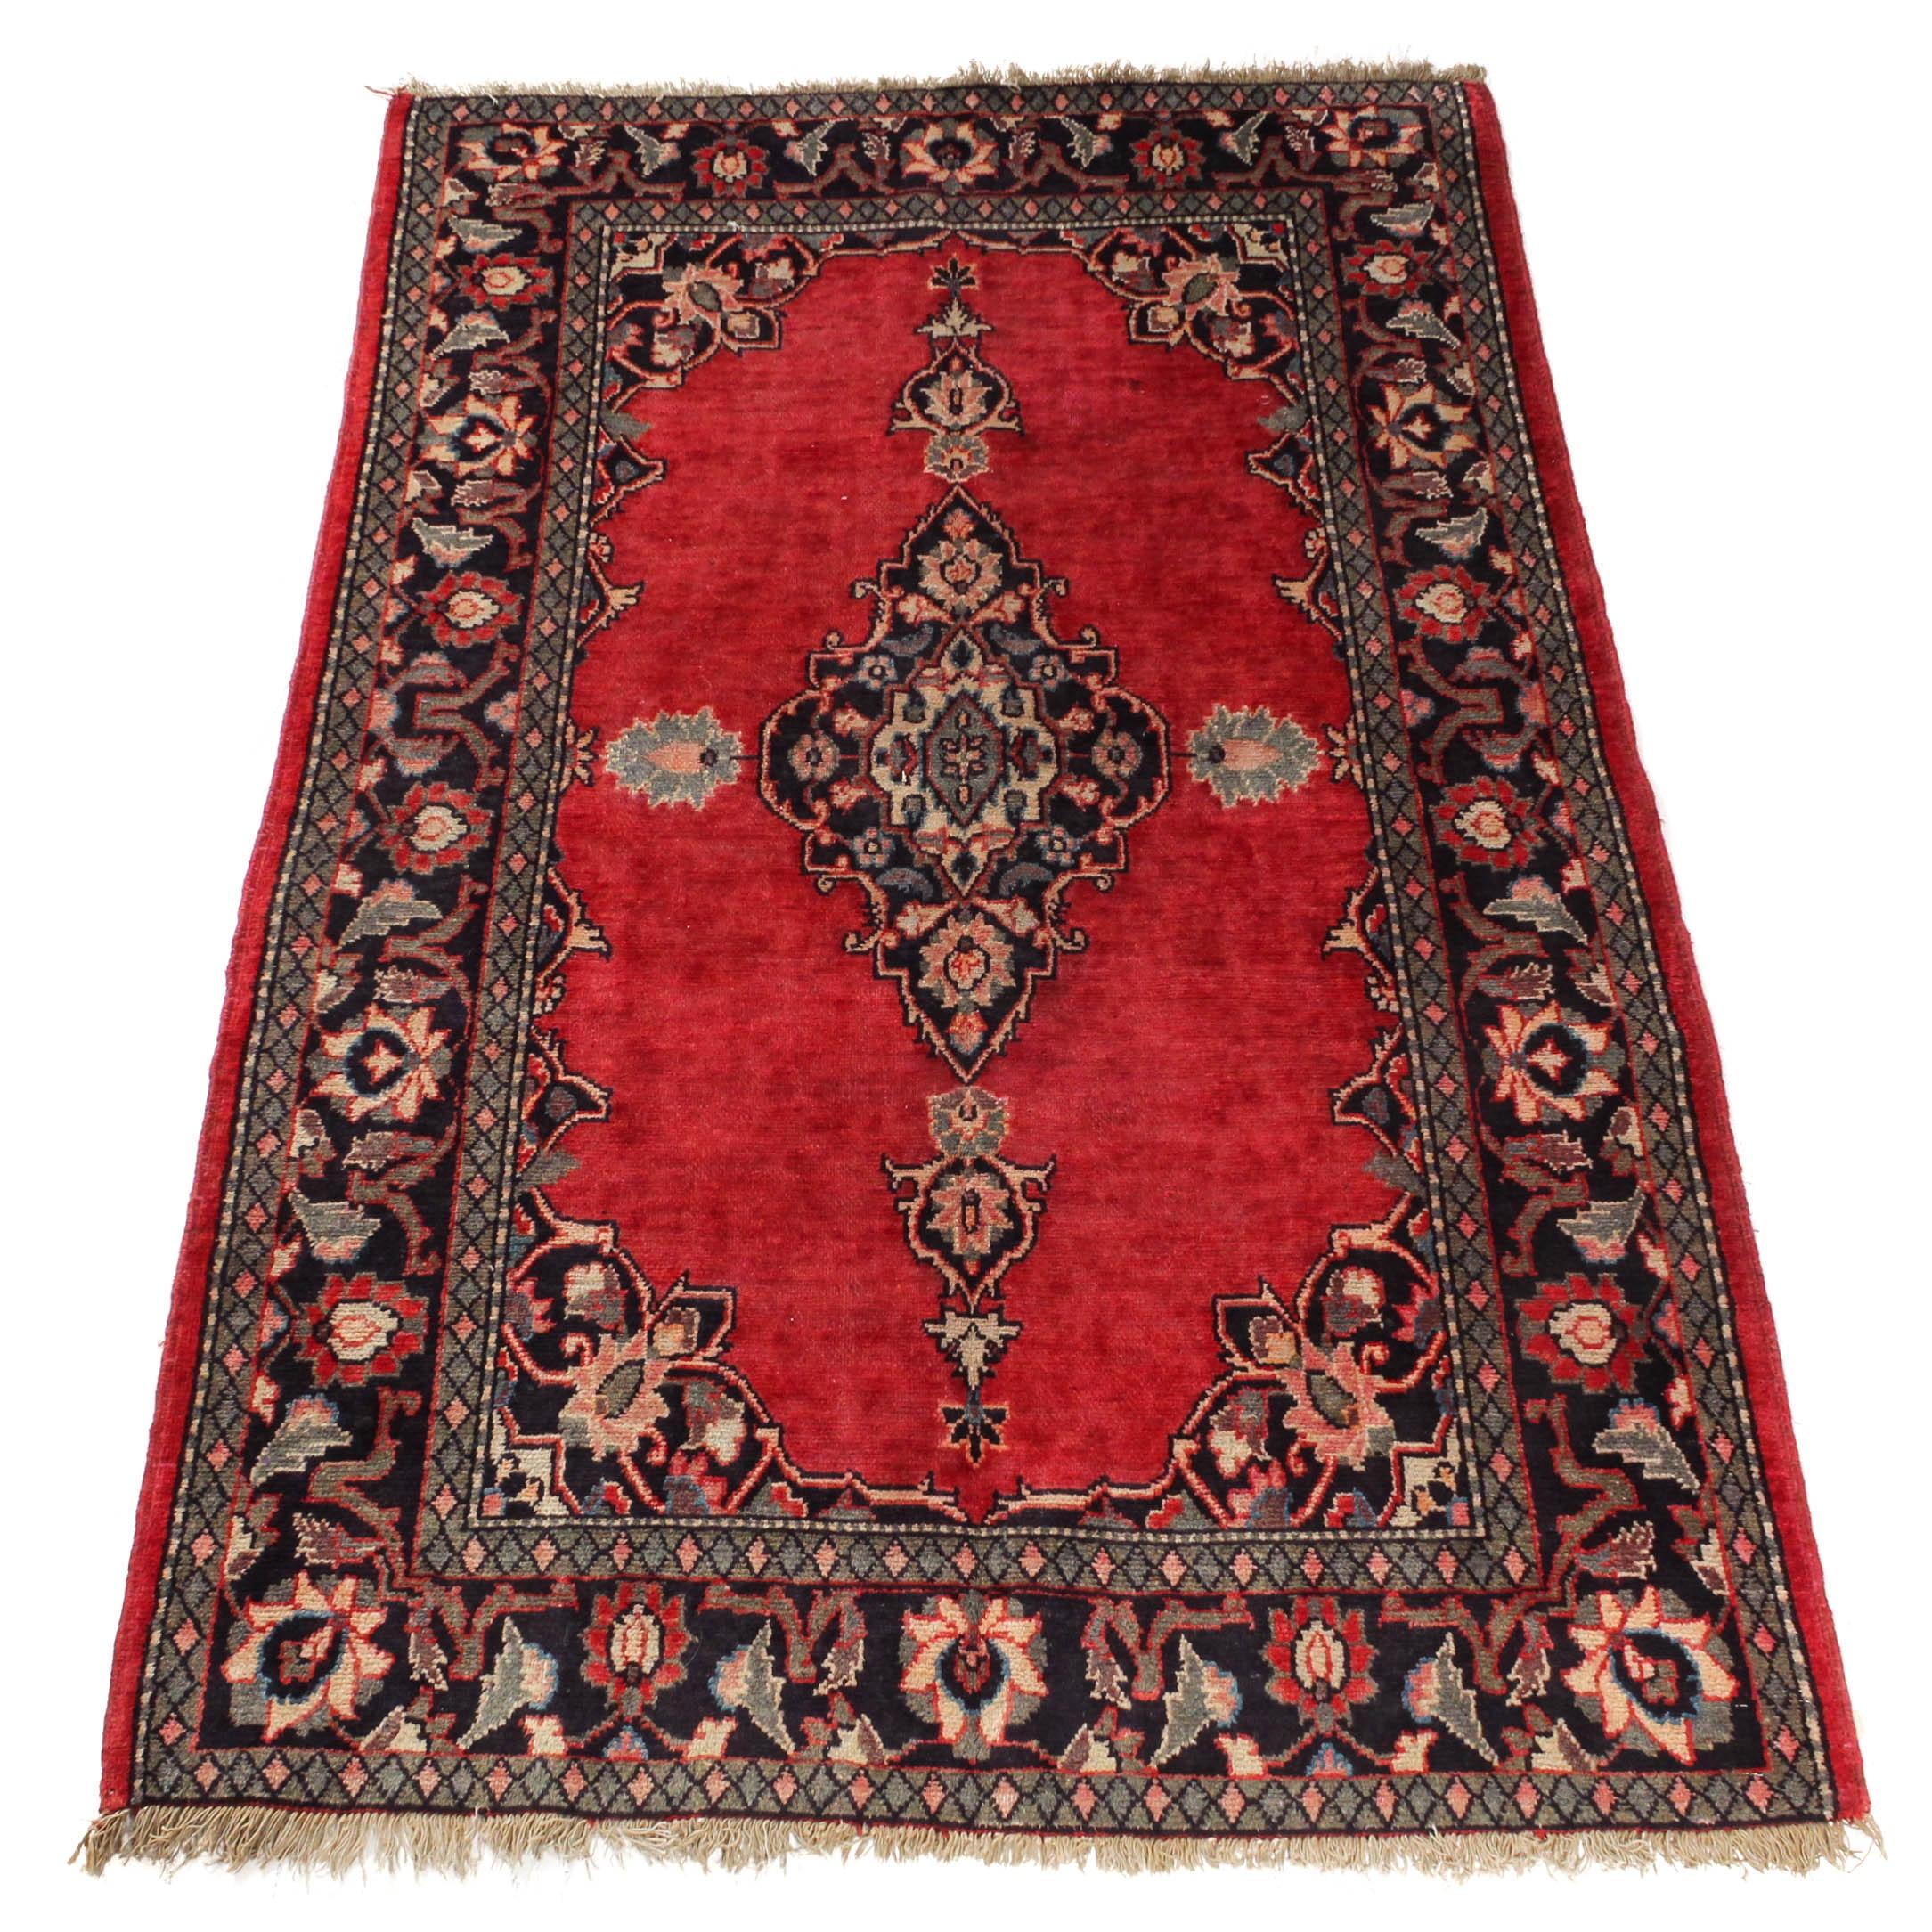 Vintage Hand-Knotted Indo-Persian Kashan Rug